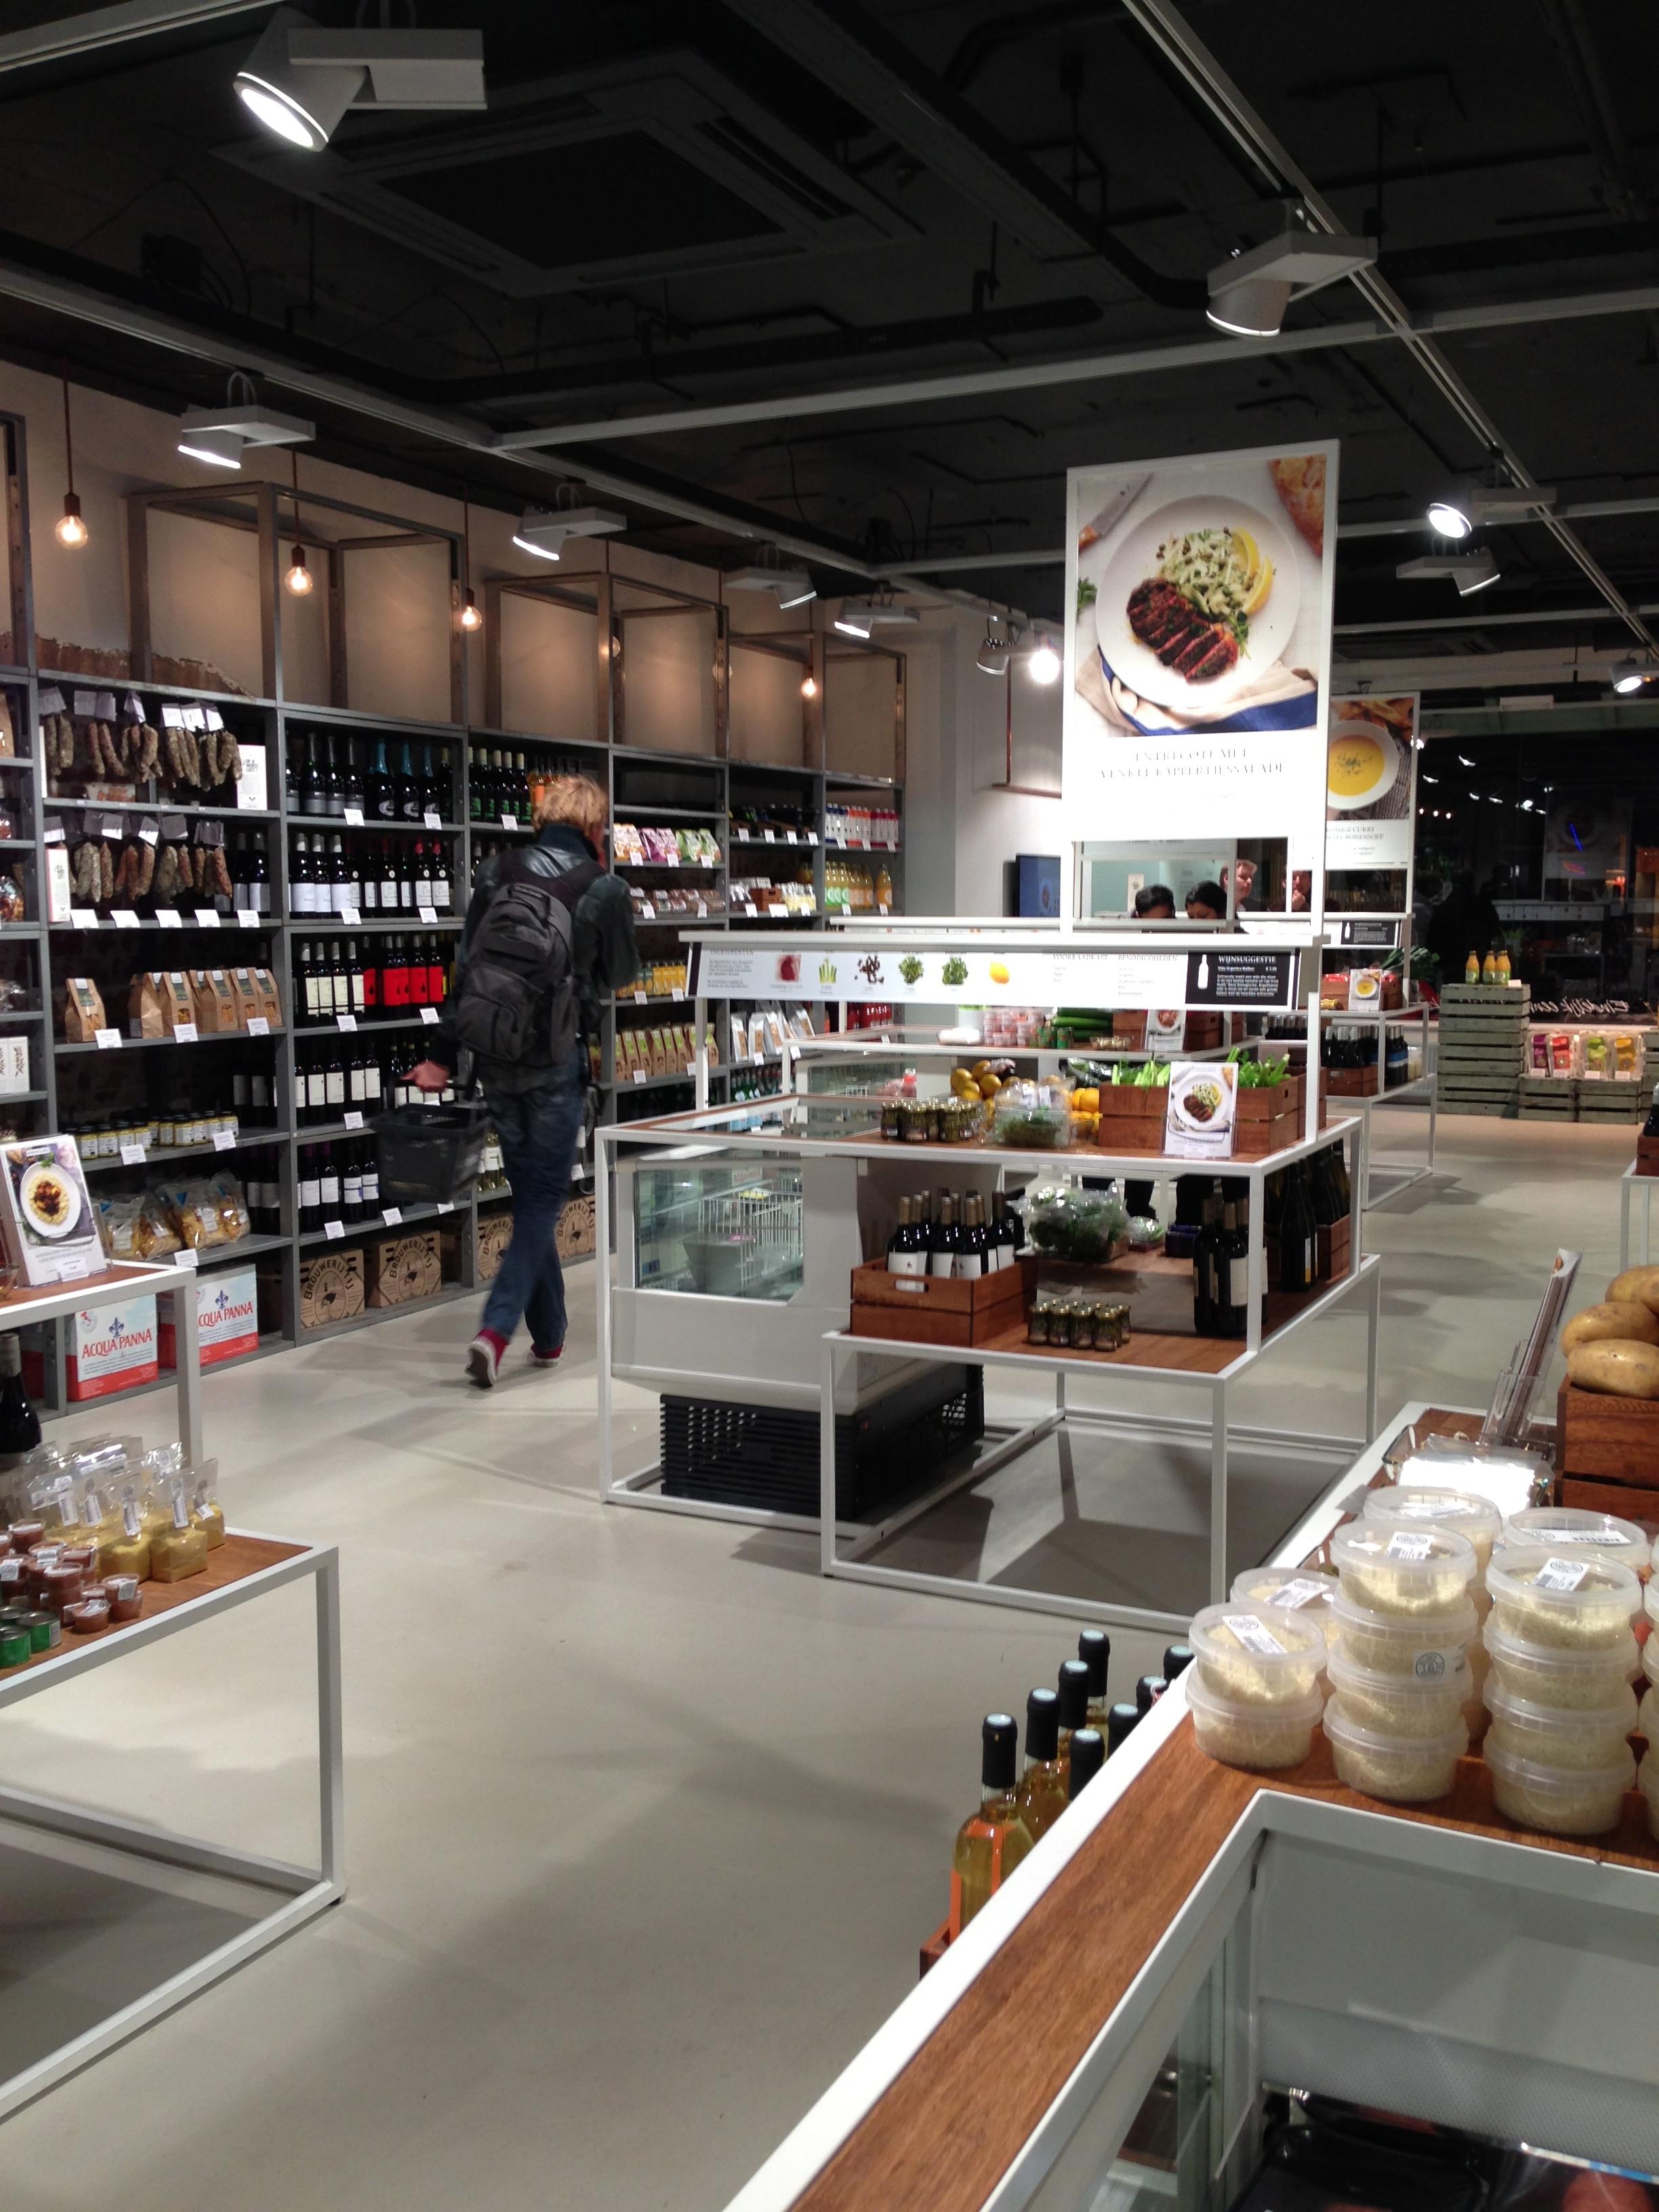 supermarkt van de toekomst, nú in Amsterdam